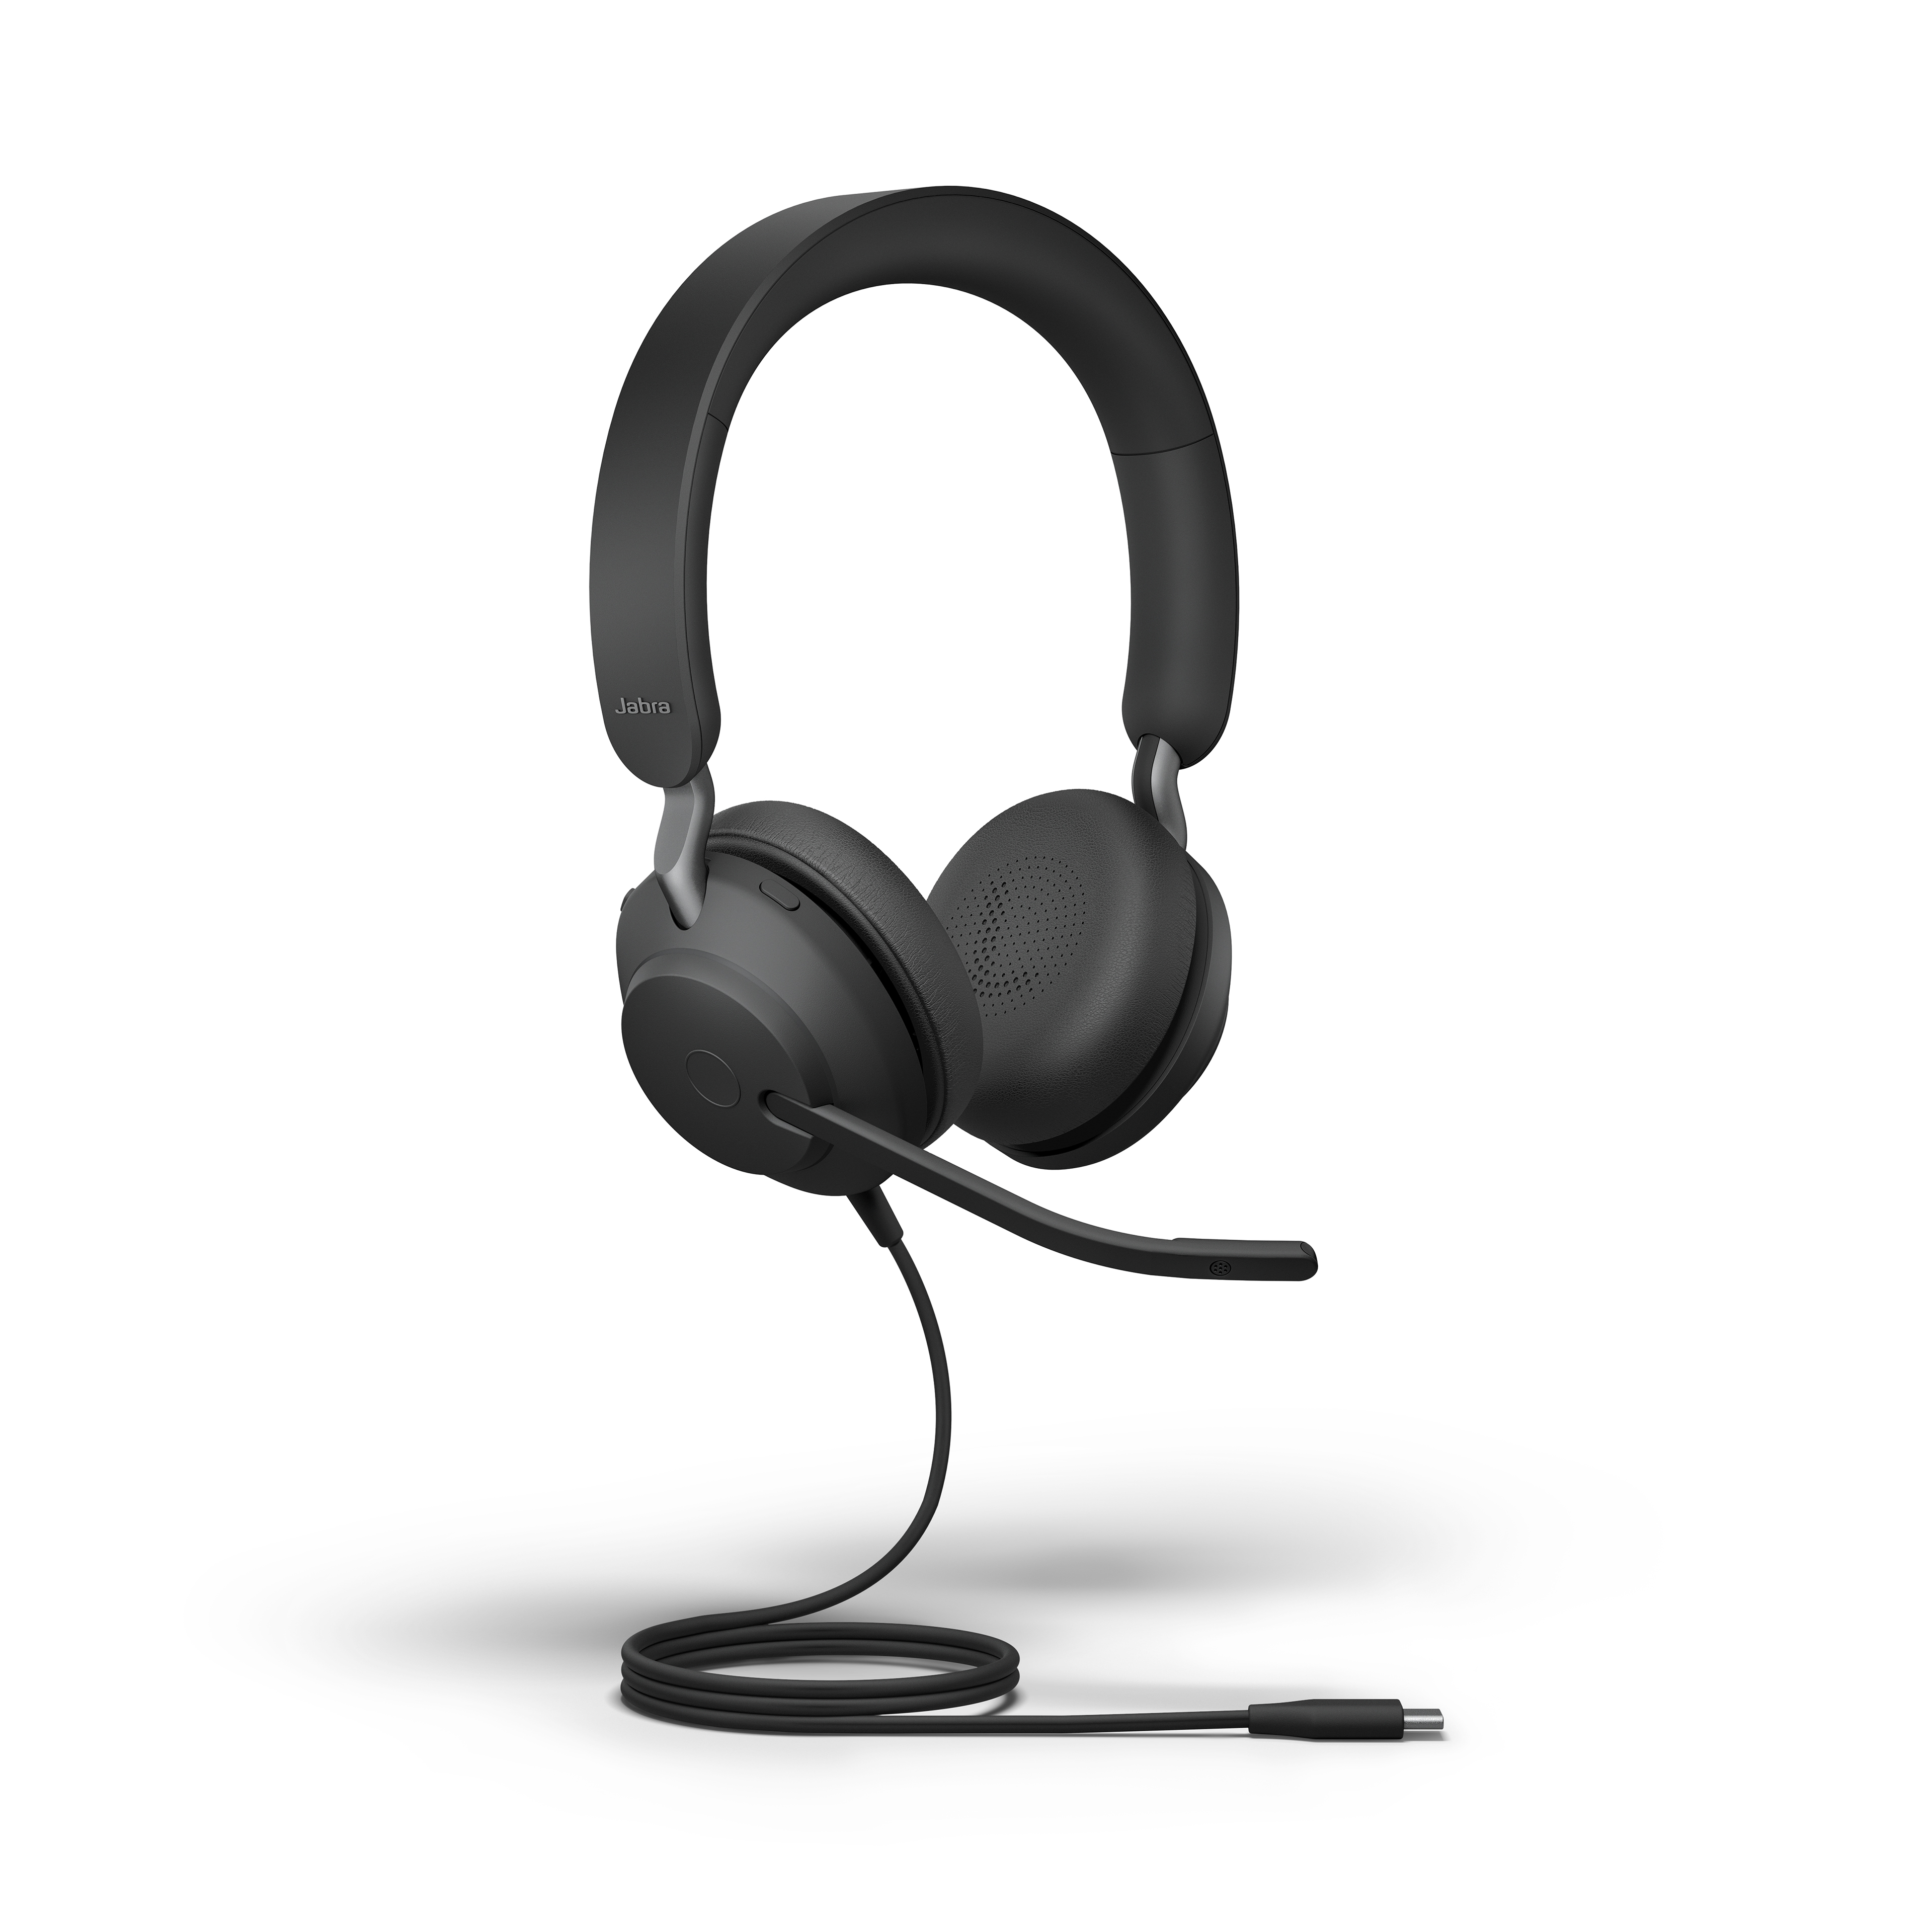 Jabra Evolve2 40 Stereo Usb C Uc Headset 24089989 899 Voip Supply